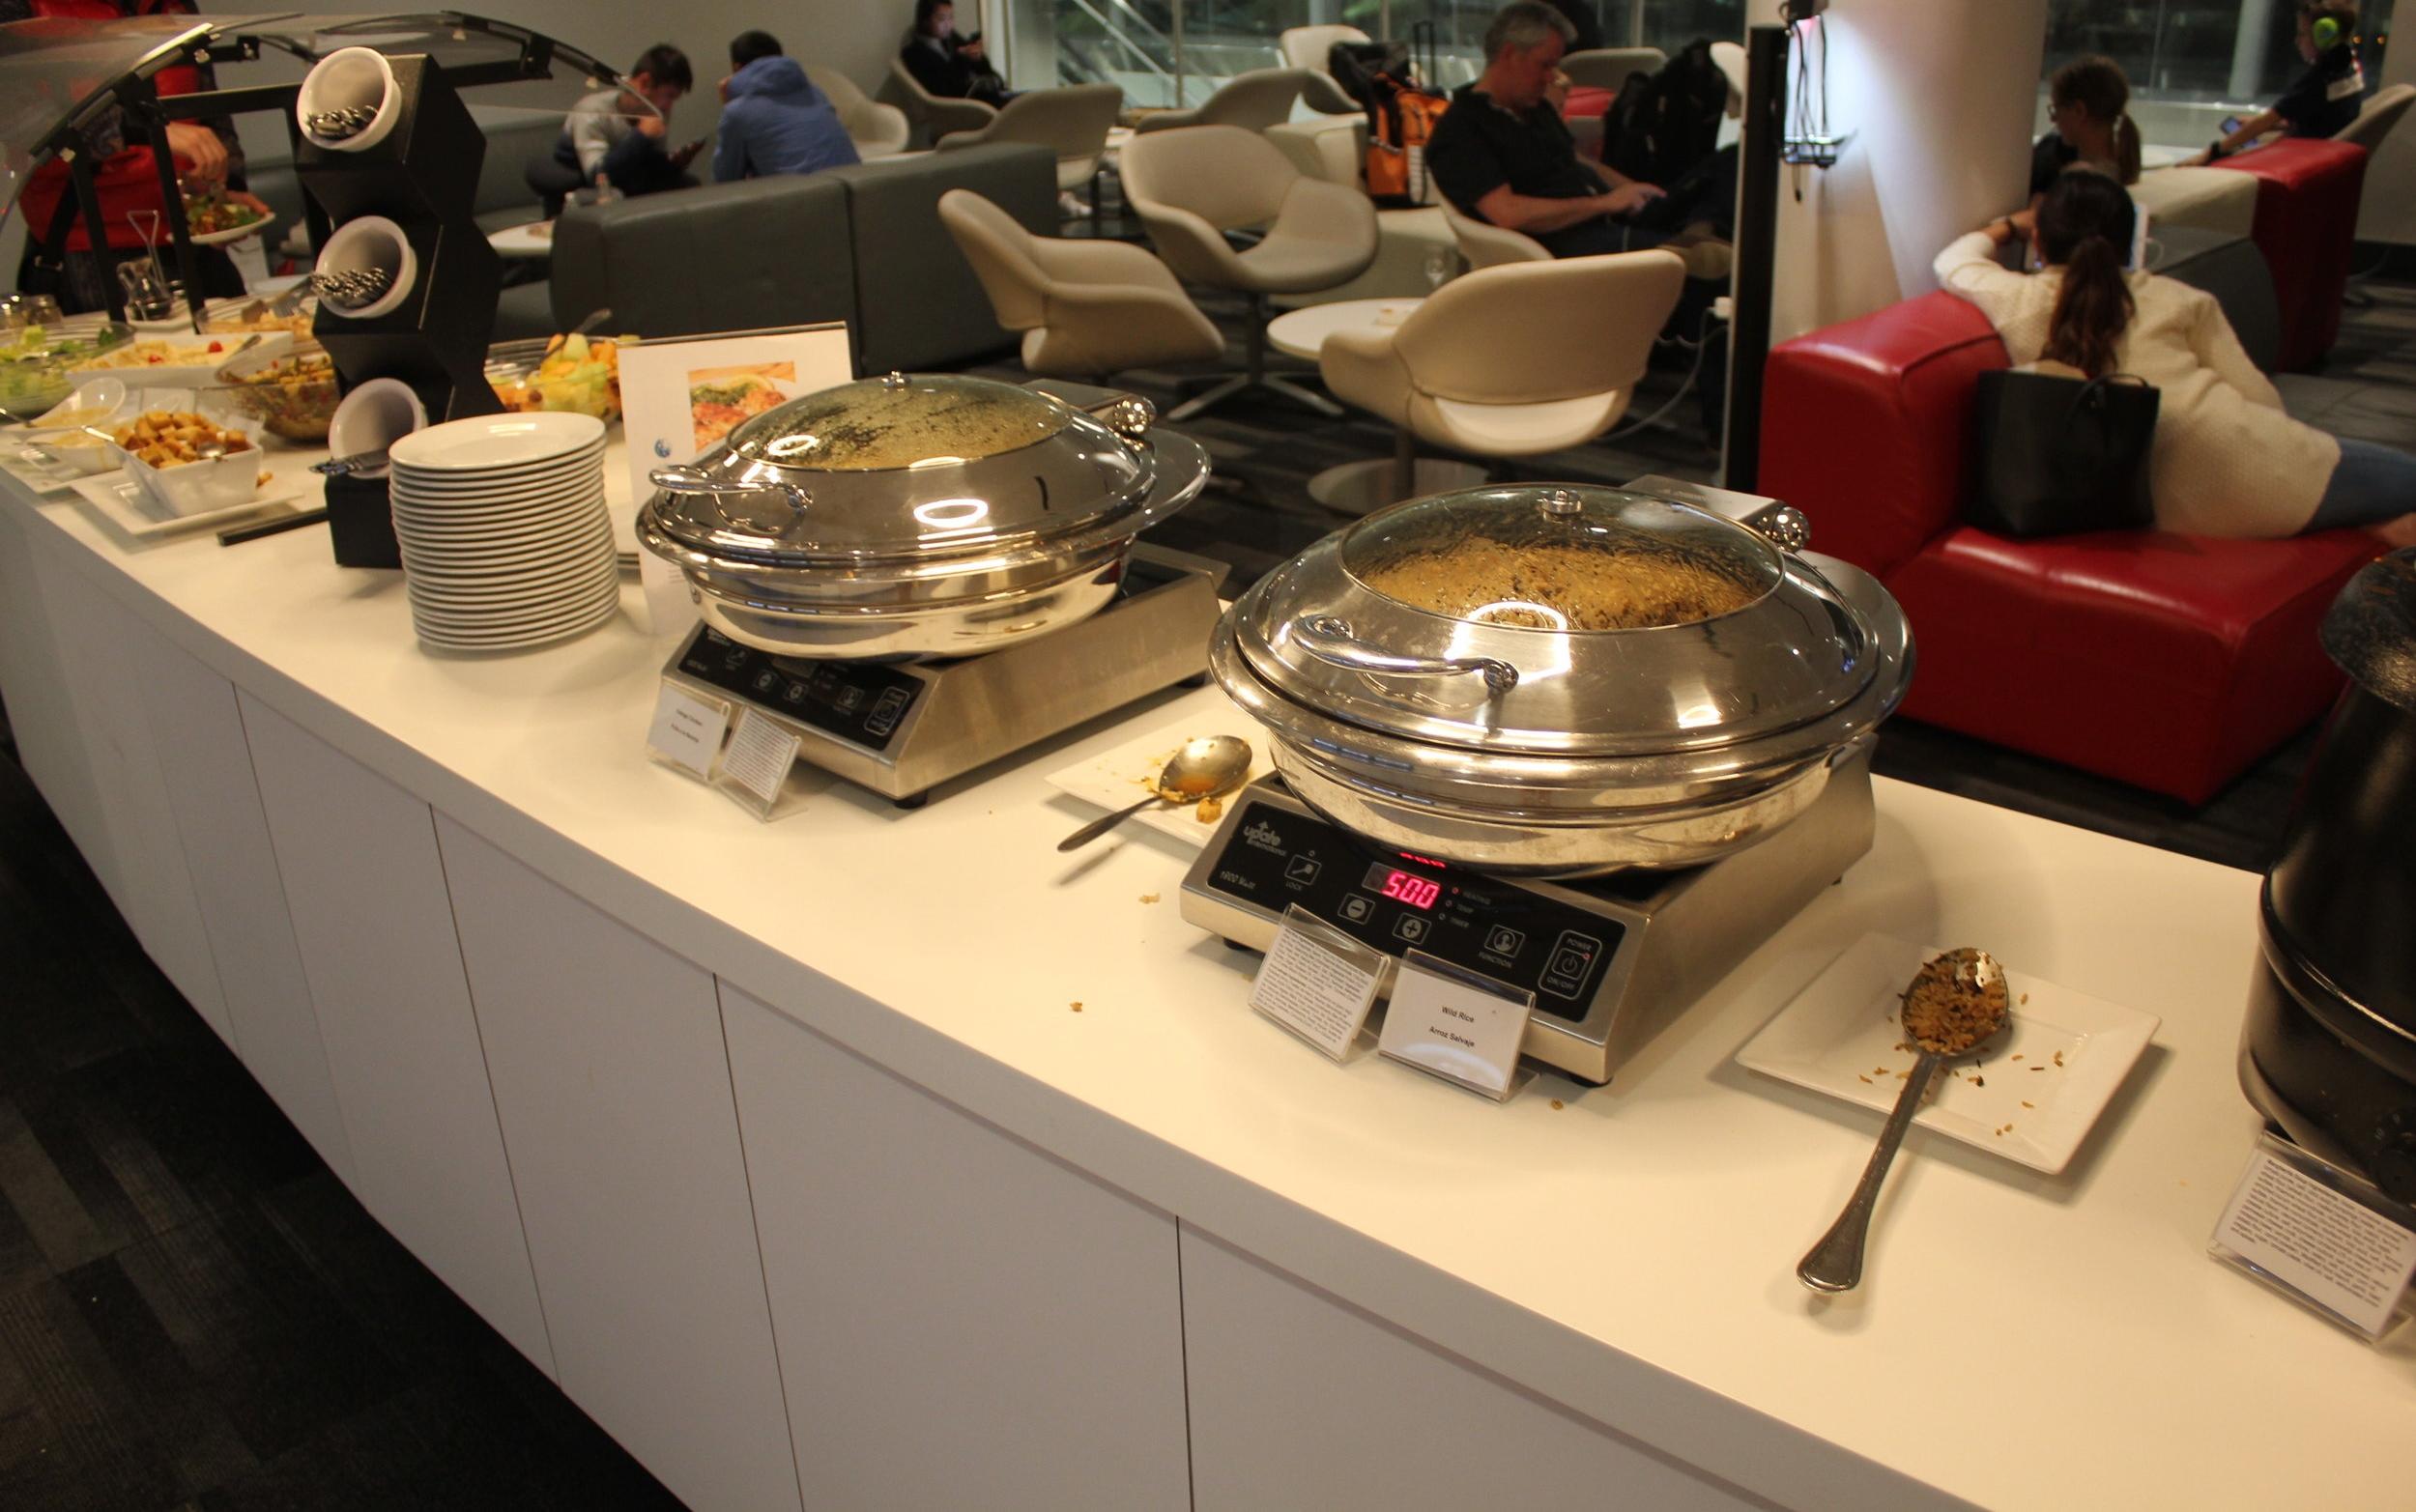 Avianca Lounge Miami – Food spread